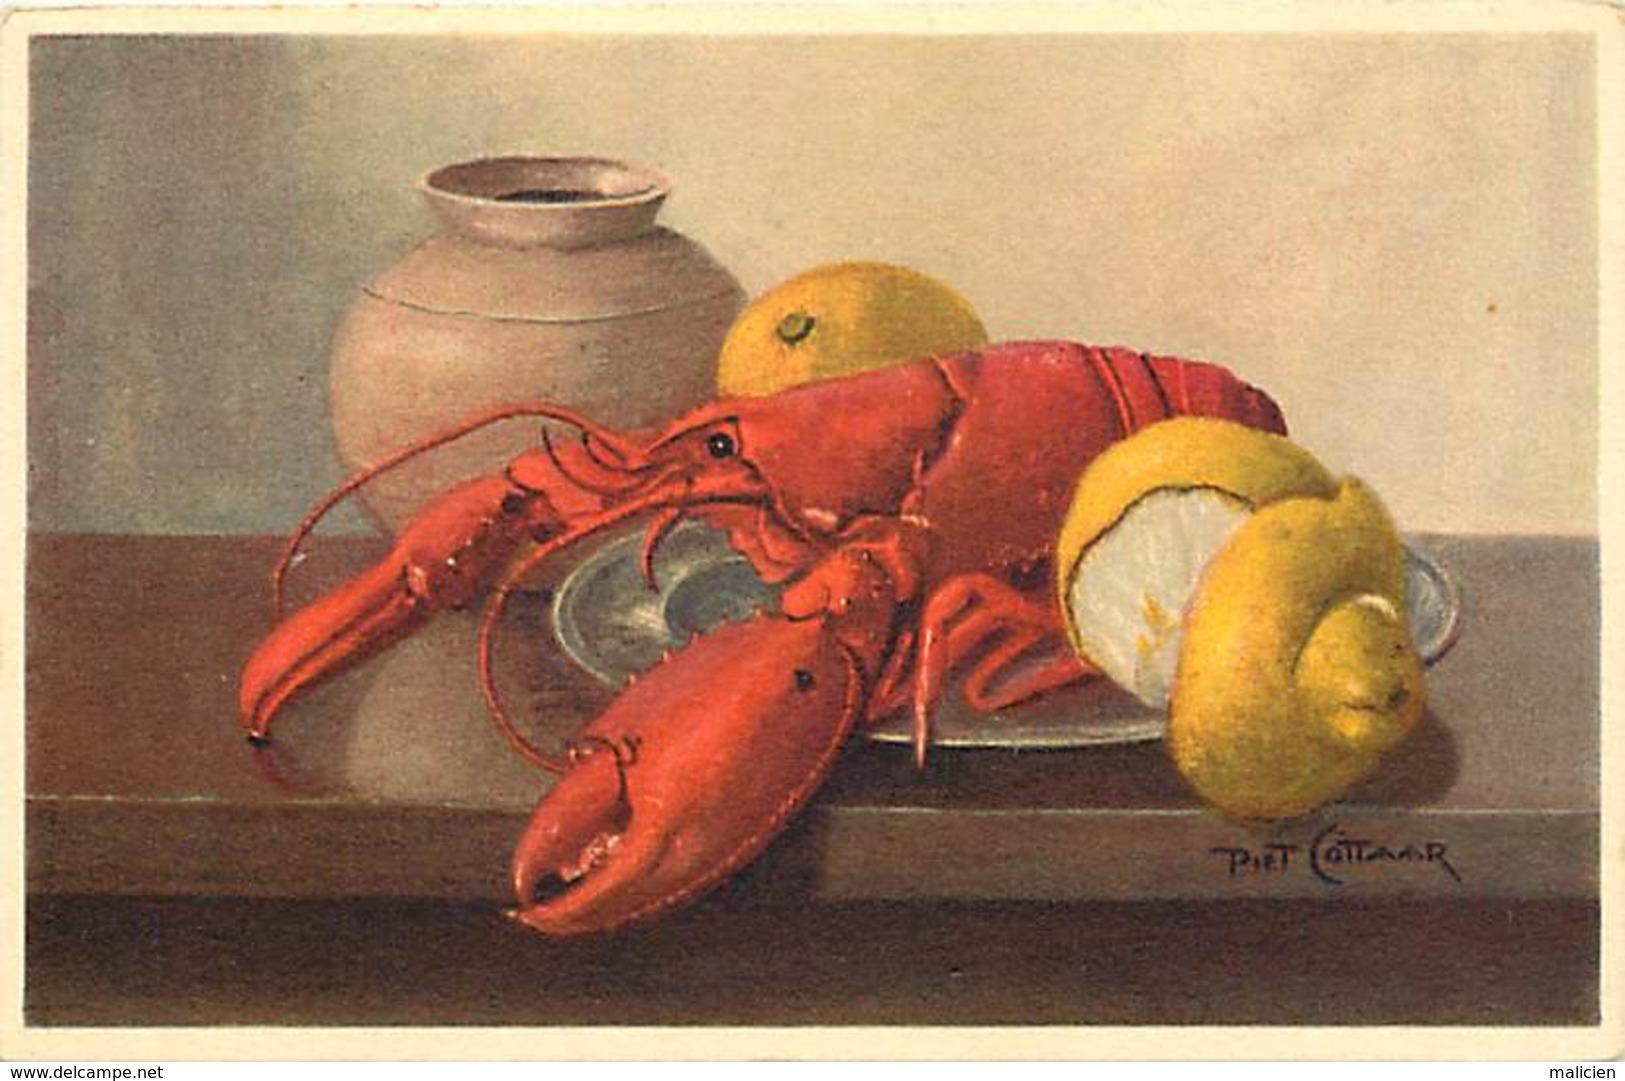 -ref-A972- Illustrateurs - Illustrateur Piet Cottaard -  Cuisine - Crustacés - Crustaces - Homard - Homards - - Illustrateurs & Photographes